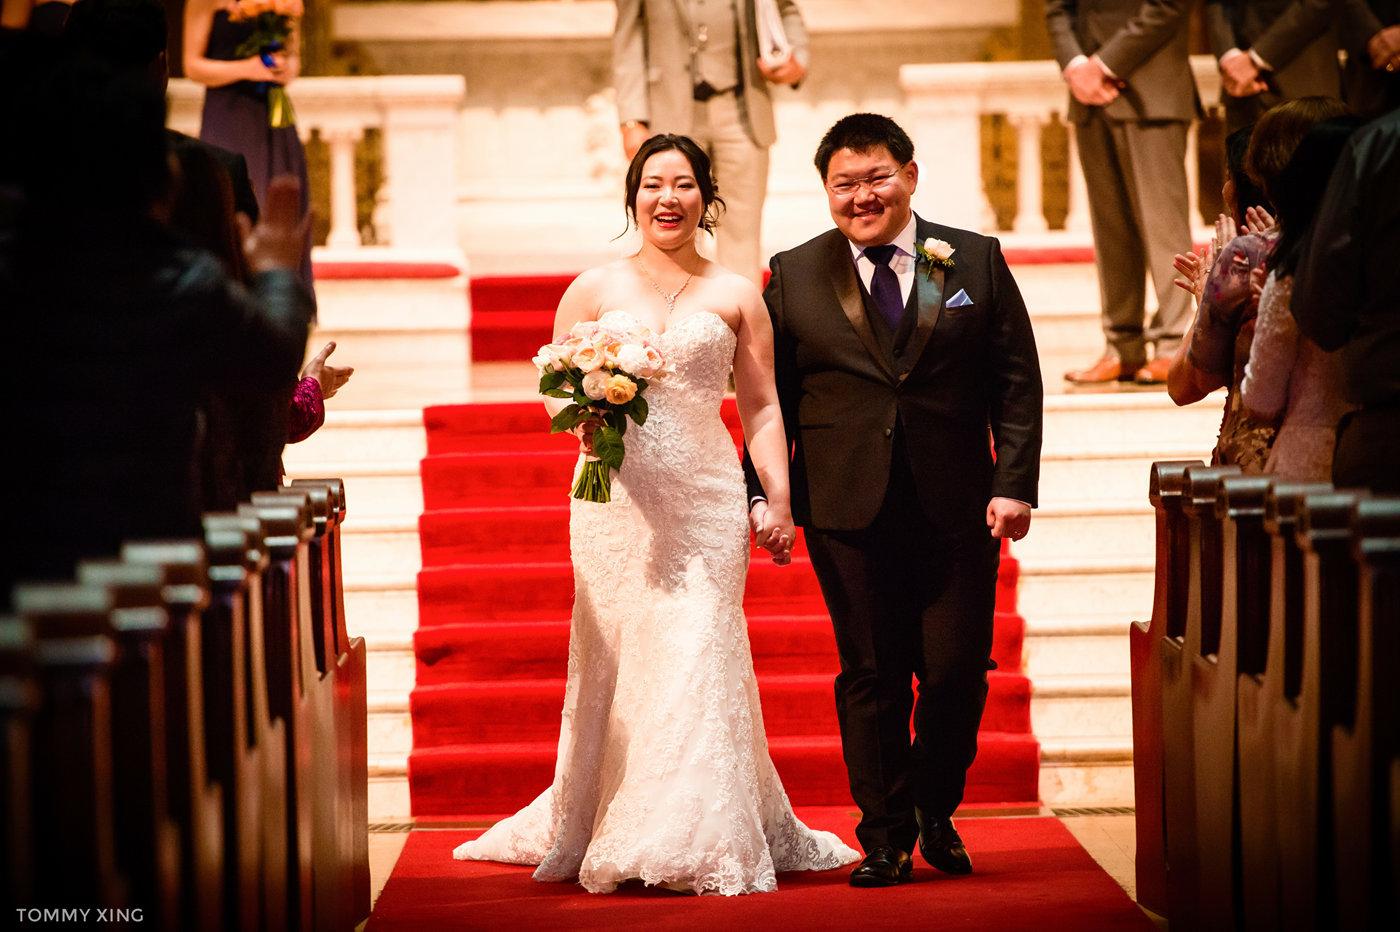 STANFORD MEMORIAL CHURCH WEDDING - Wenjie & Chengcheng - SAN FRANCISCO BAY AREA 斯坦福教堂婚礼跟拍 - 洛杉矶婚礼婚纱照摄影师 Tommy Xing Photography121.jpg